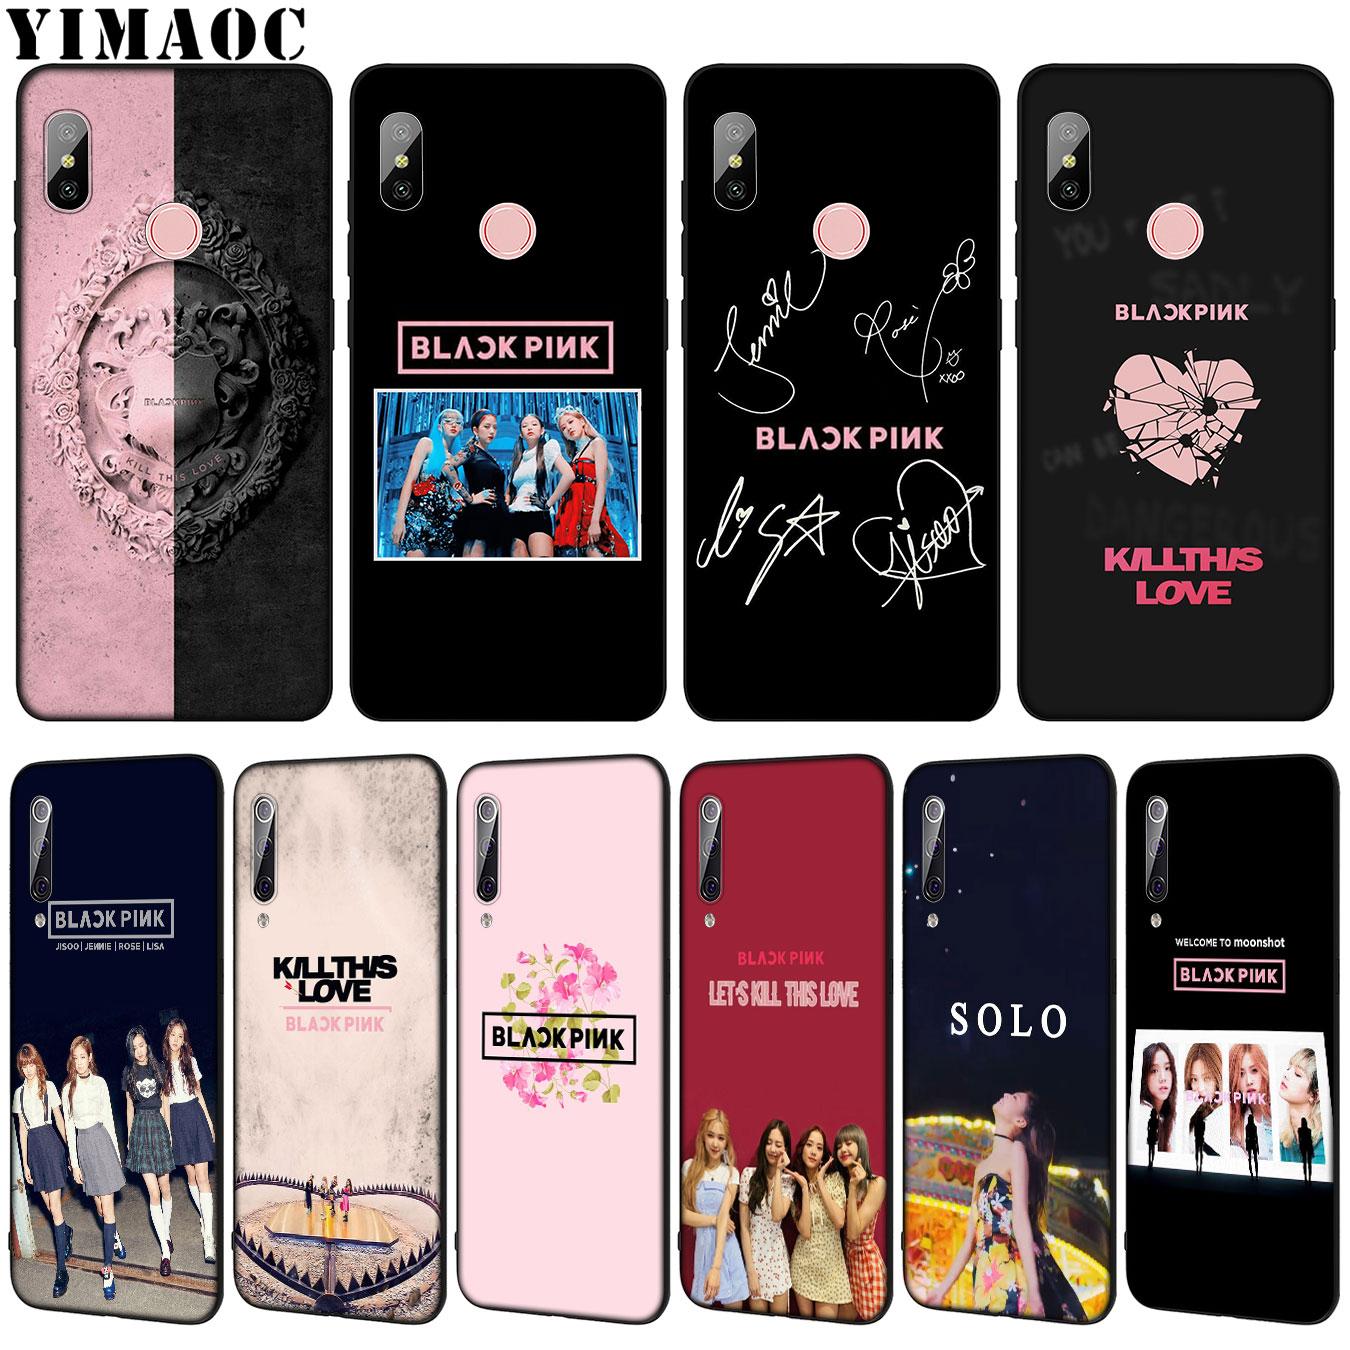 Phone Bags & Cases Nice Lavaza Kpop Blackpink Black Pink Phone Cover Case For Xiaomi Mi 9 8 Se A2 Lite A1 Pocophone F1 6 6x 5s 5x Mix 2s Max 3 Mi9 Mi8 Half-wrapped Case